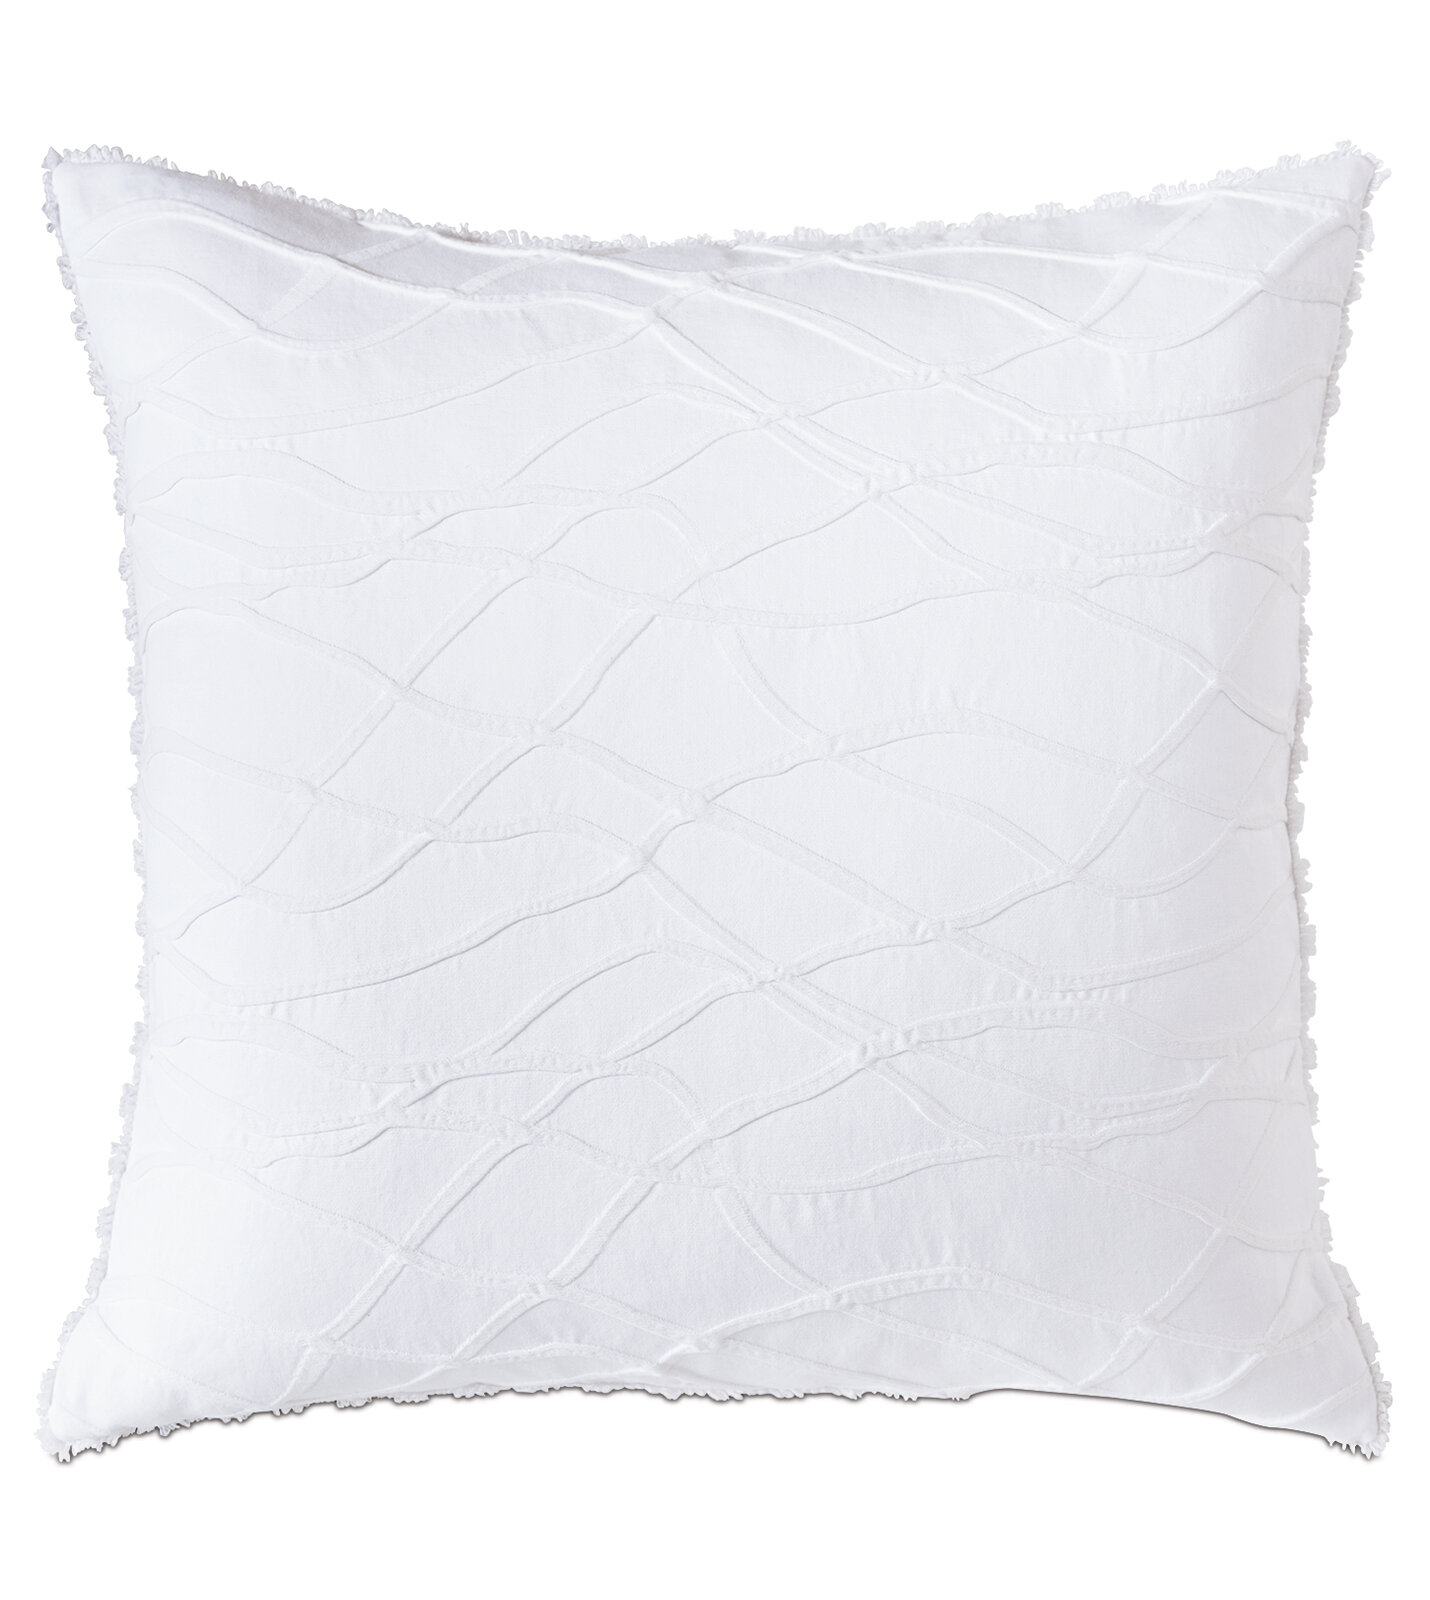 Eastern Accents Maude Gimp Line Cotton Throw Pillow Wayfair